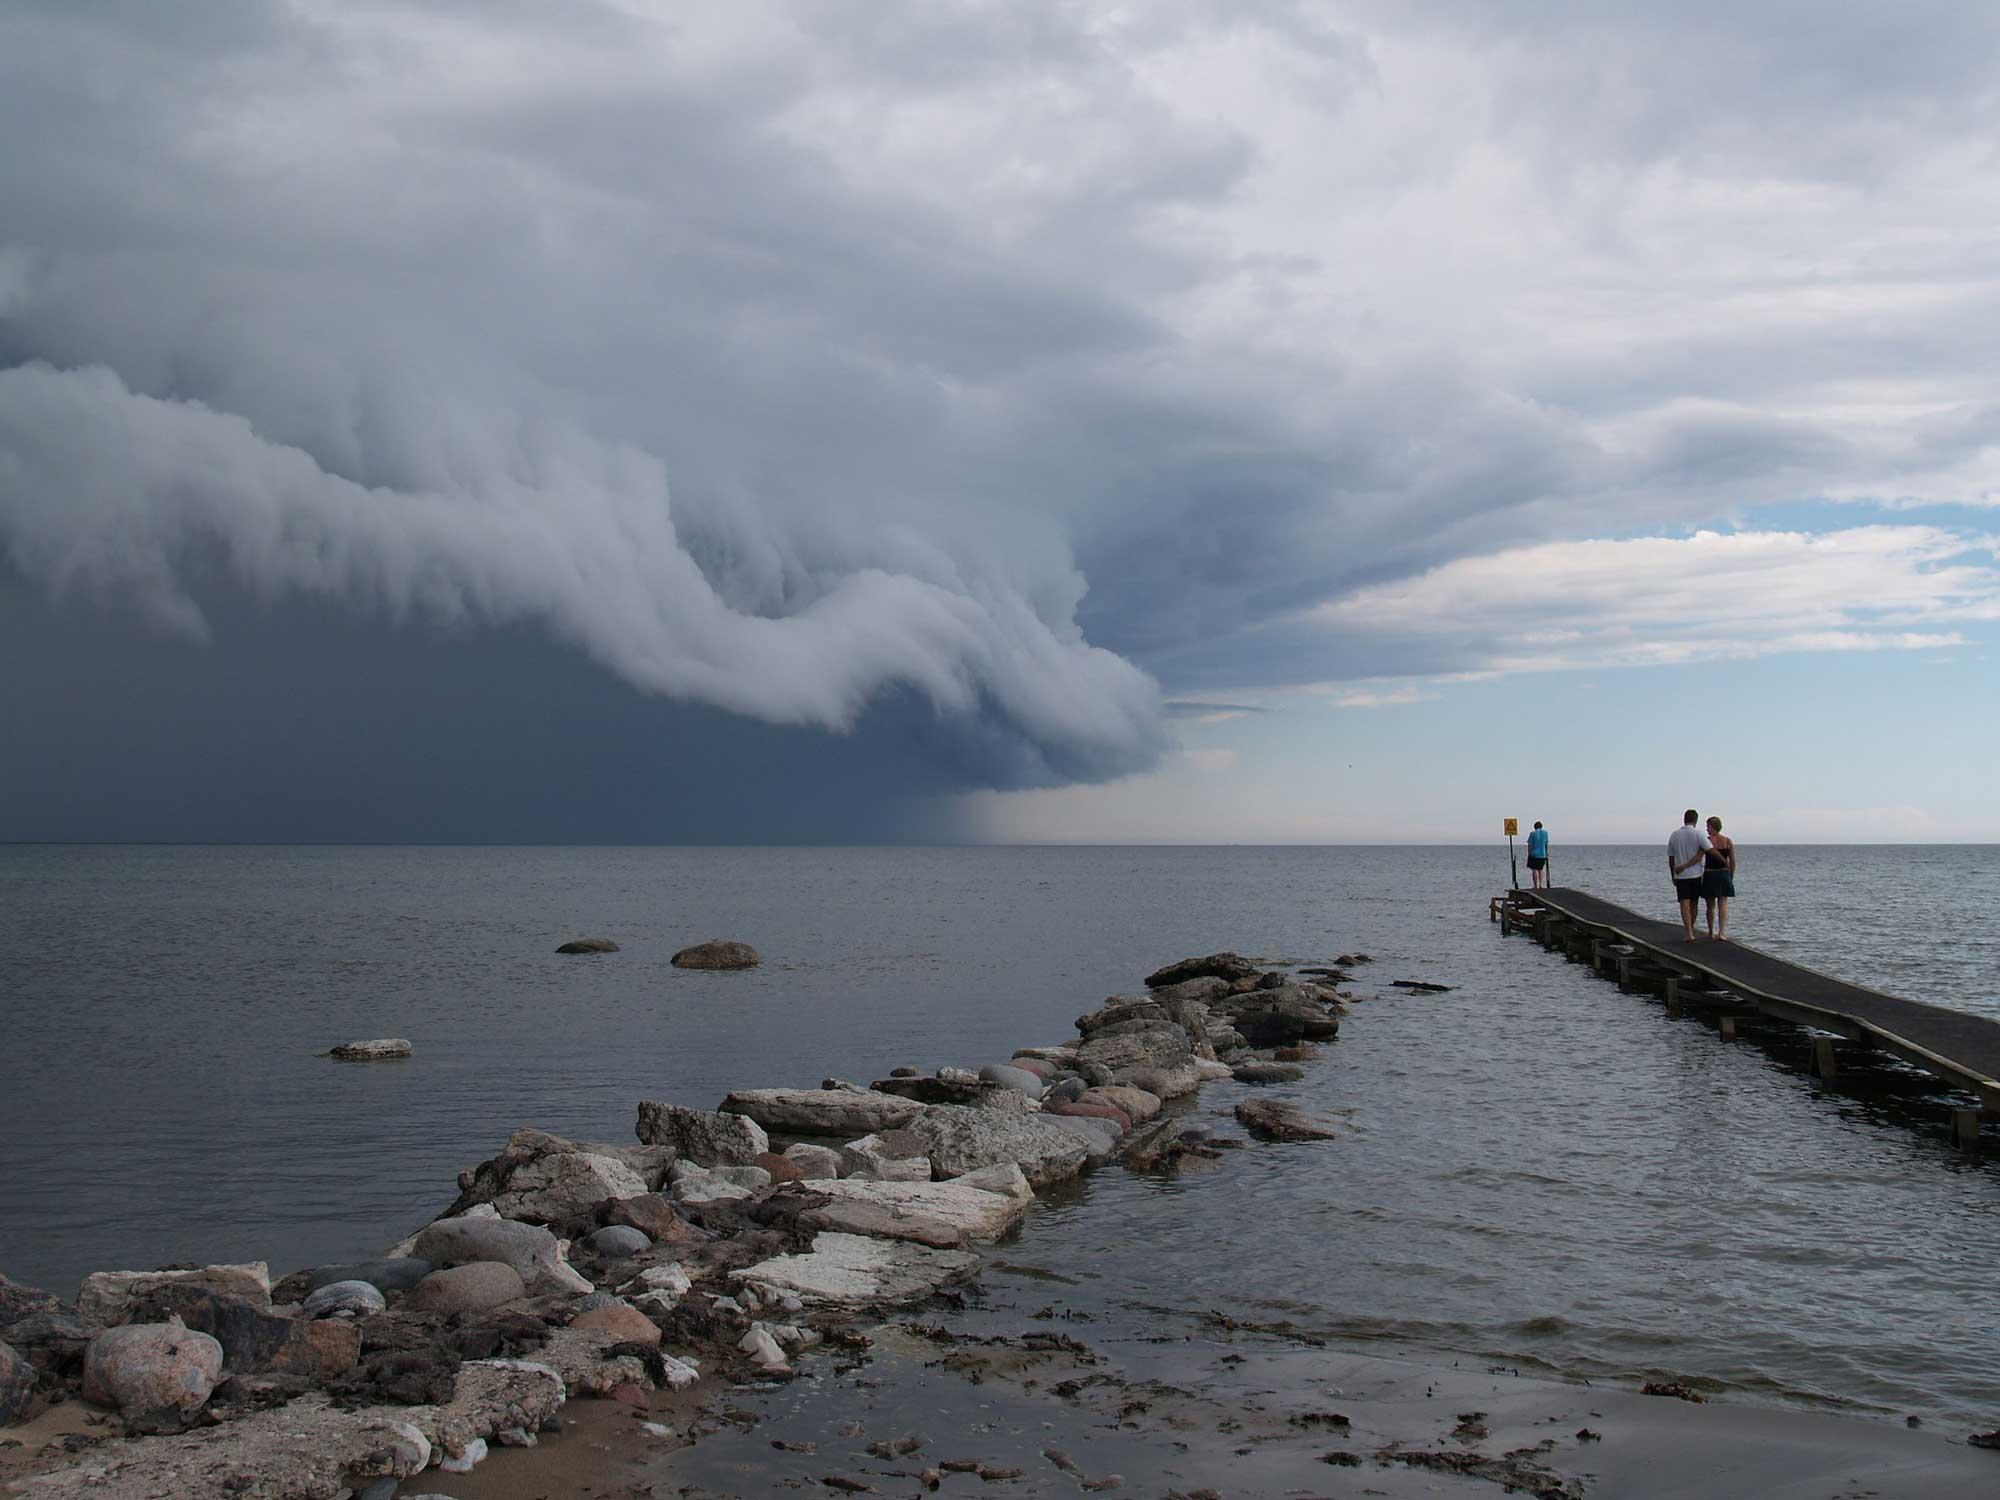 Photograph of a thunderstorm featuring a shelf cloud.